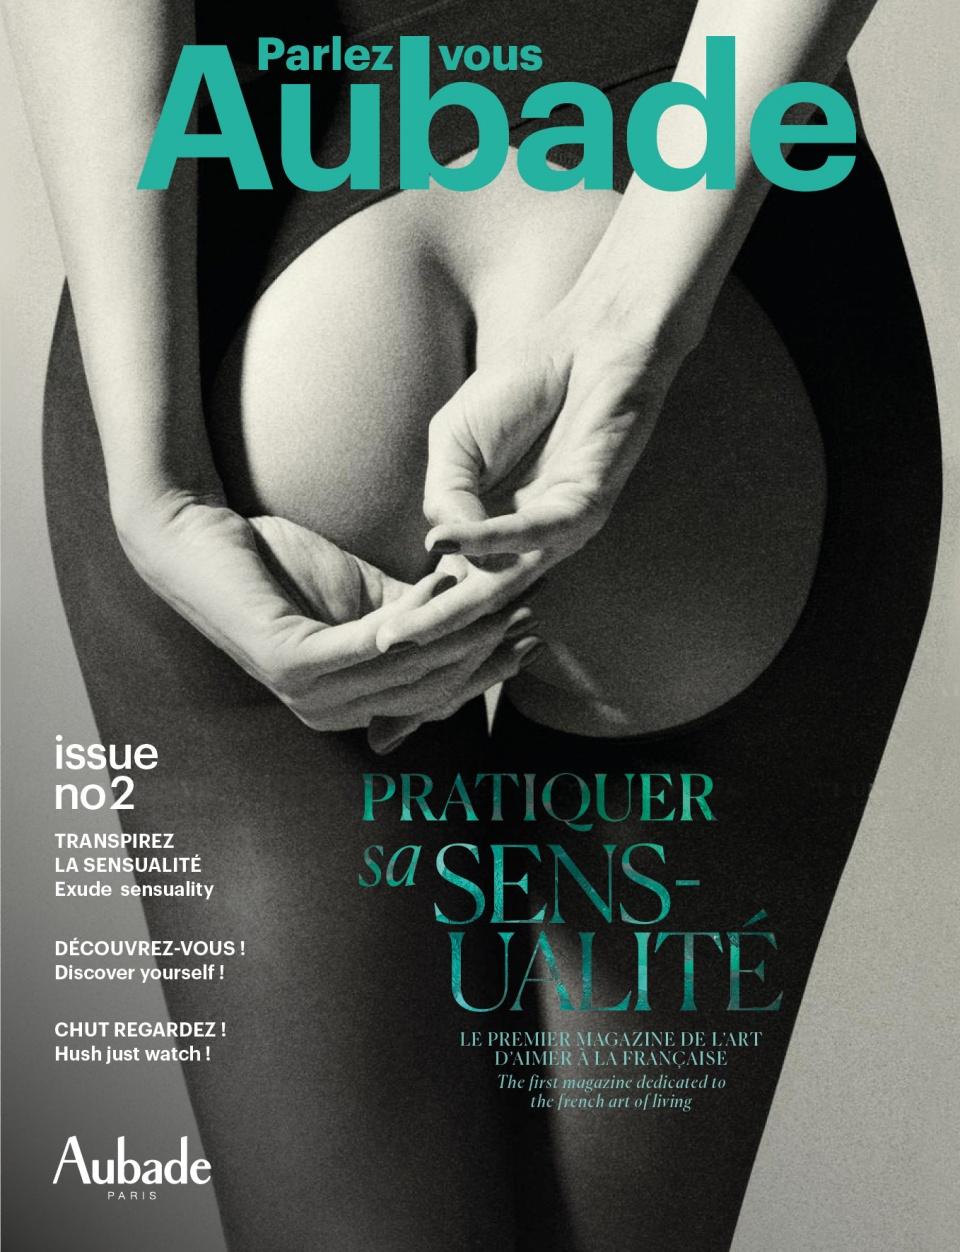 Couverture magazine Aubade